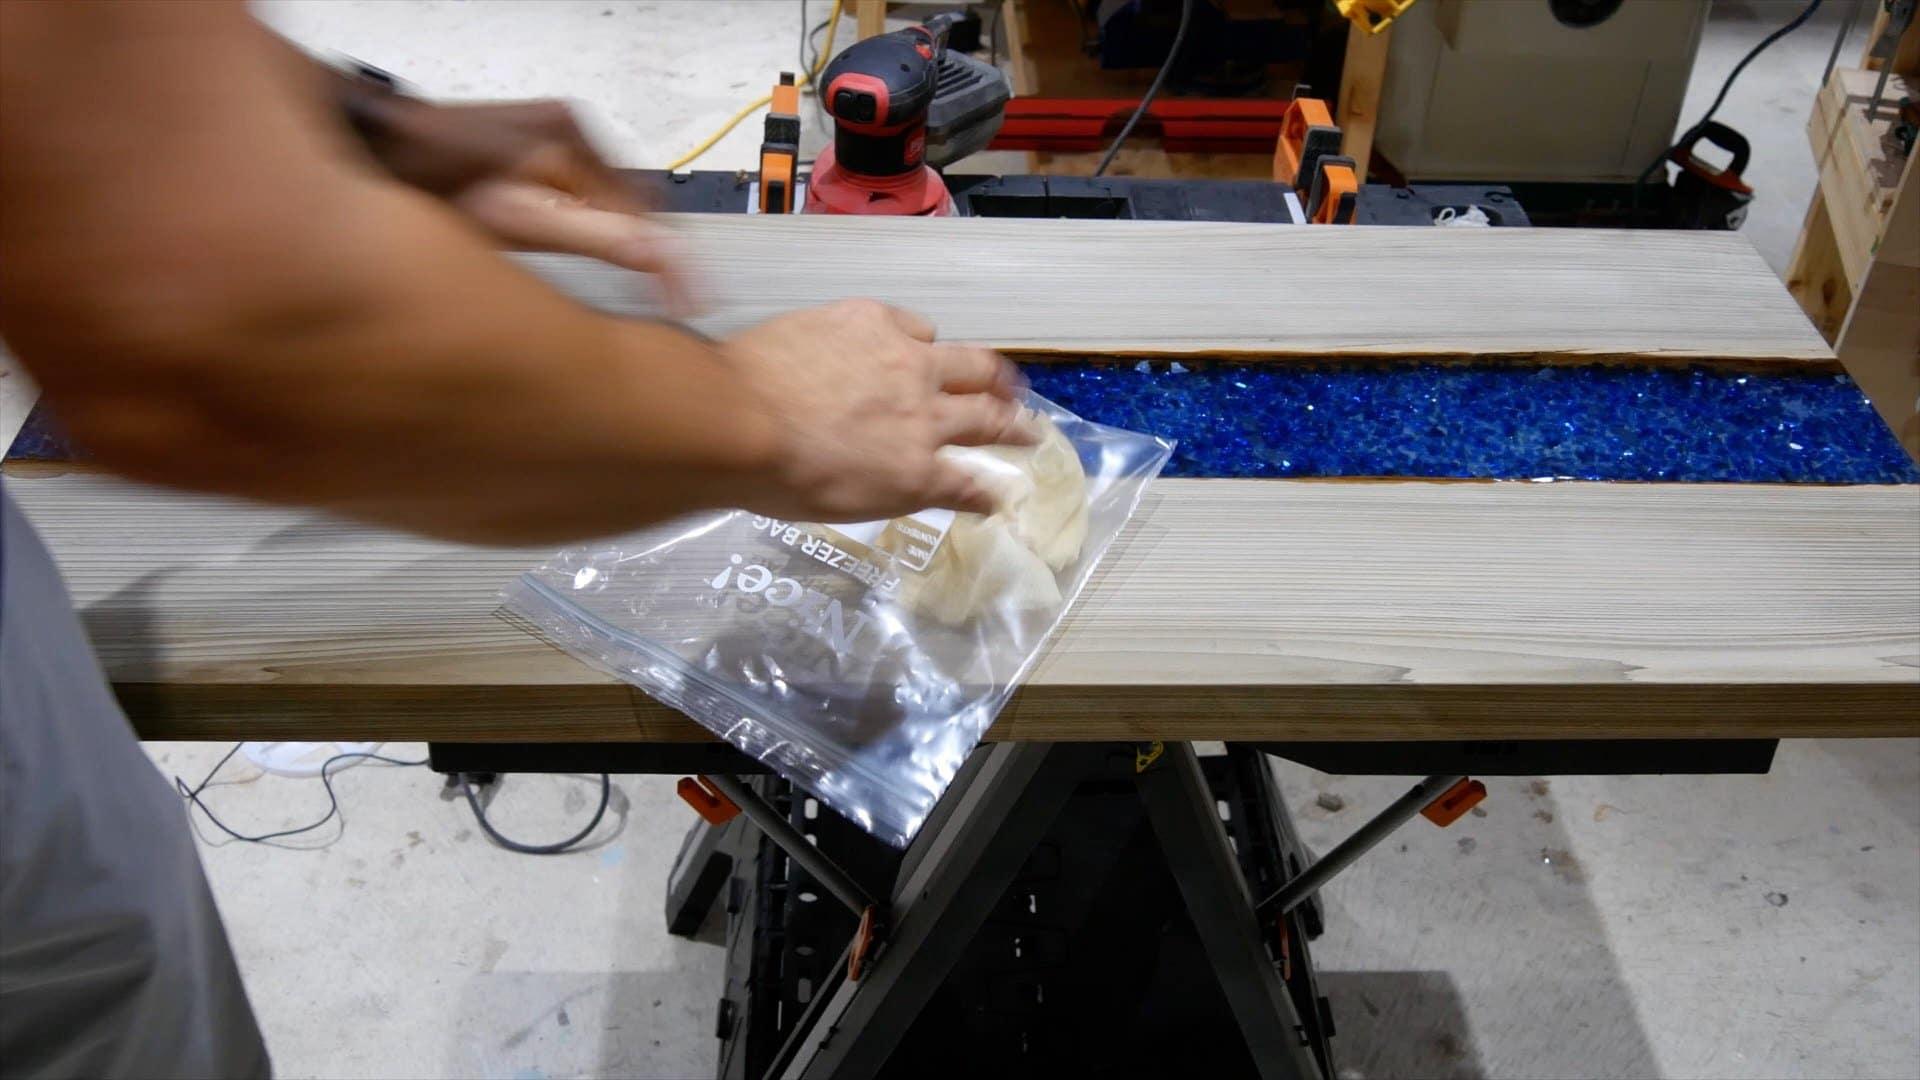 epoxy-resin-river-table-glowpowder_20171016_75